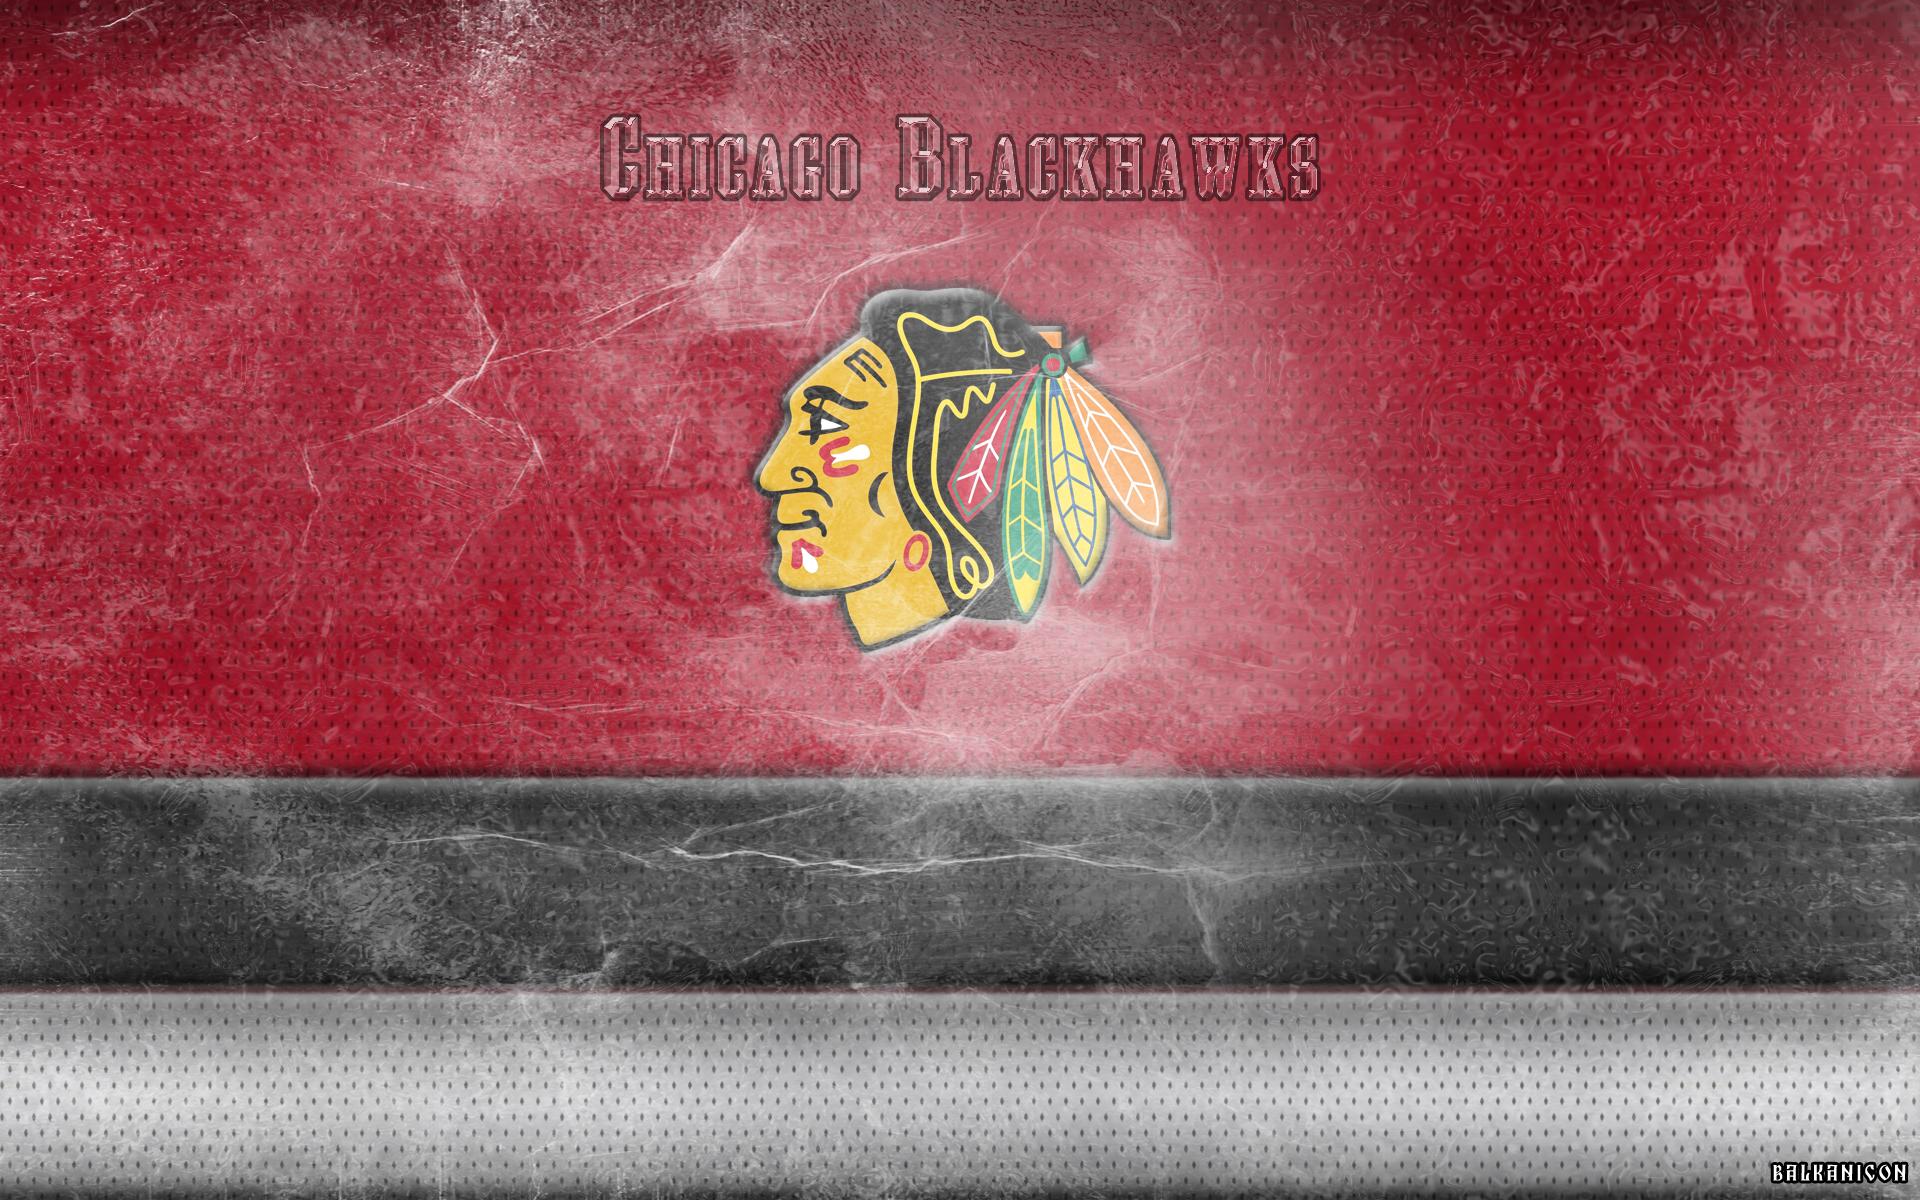 Chicago Blackhawks Wallpaper By Balkanicon